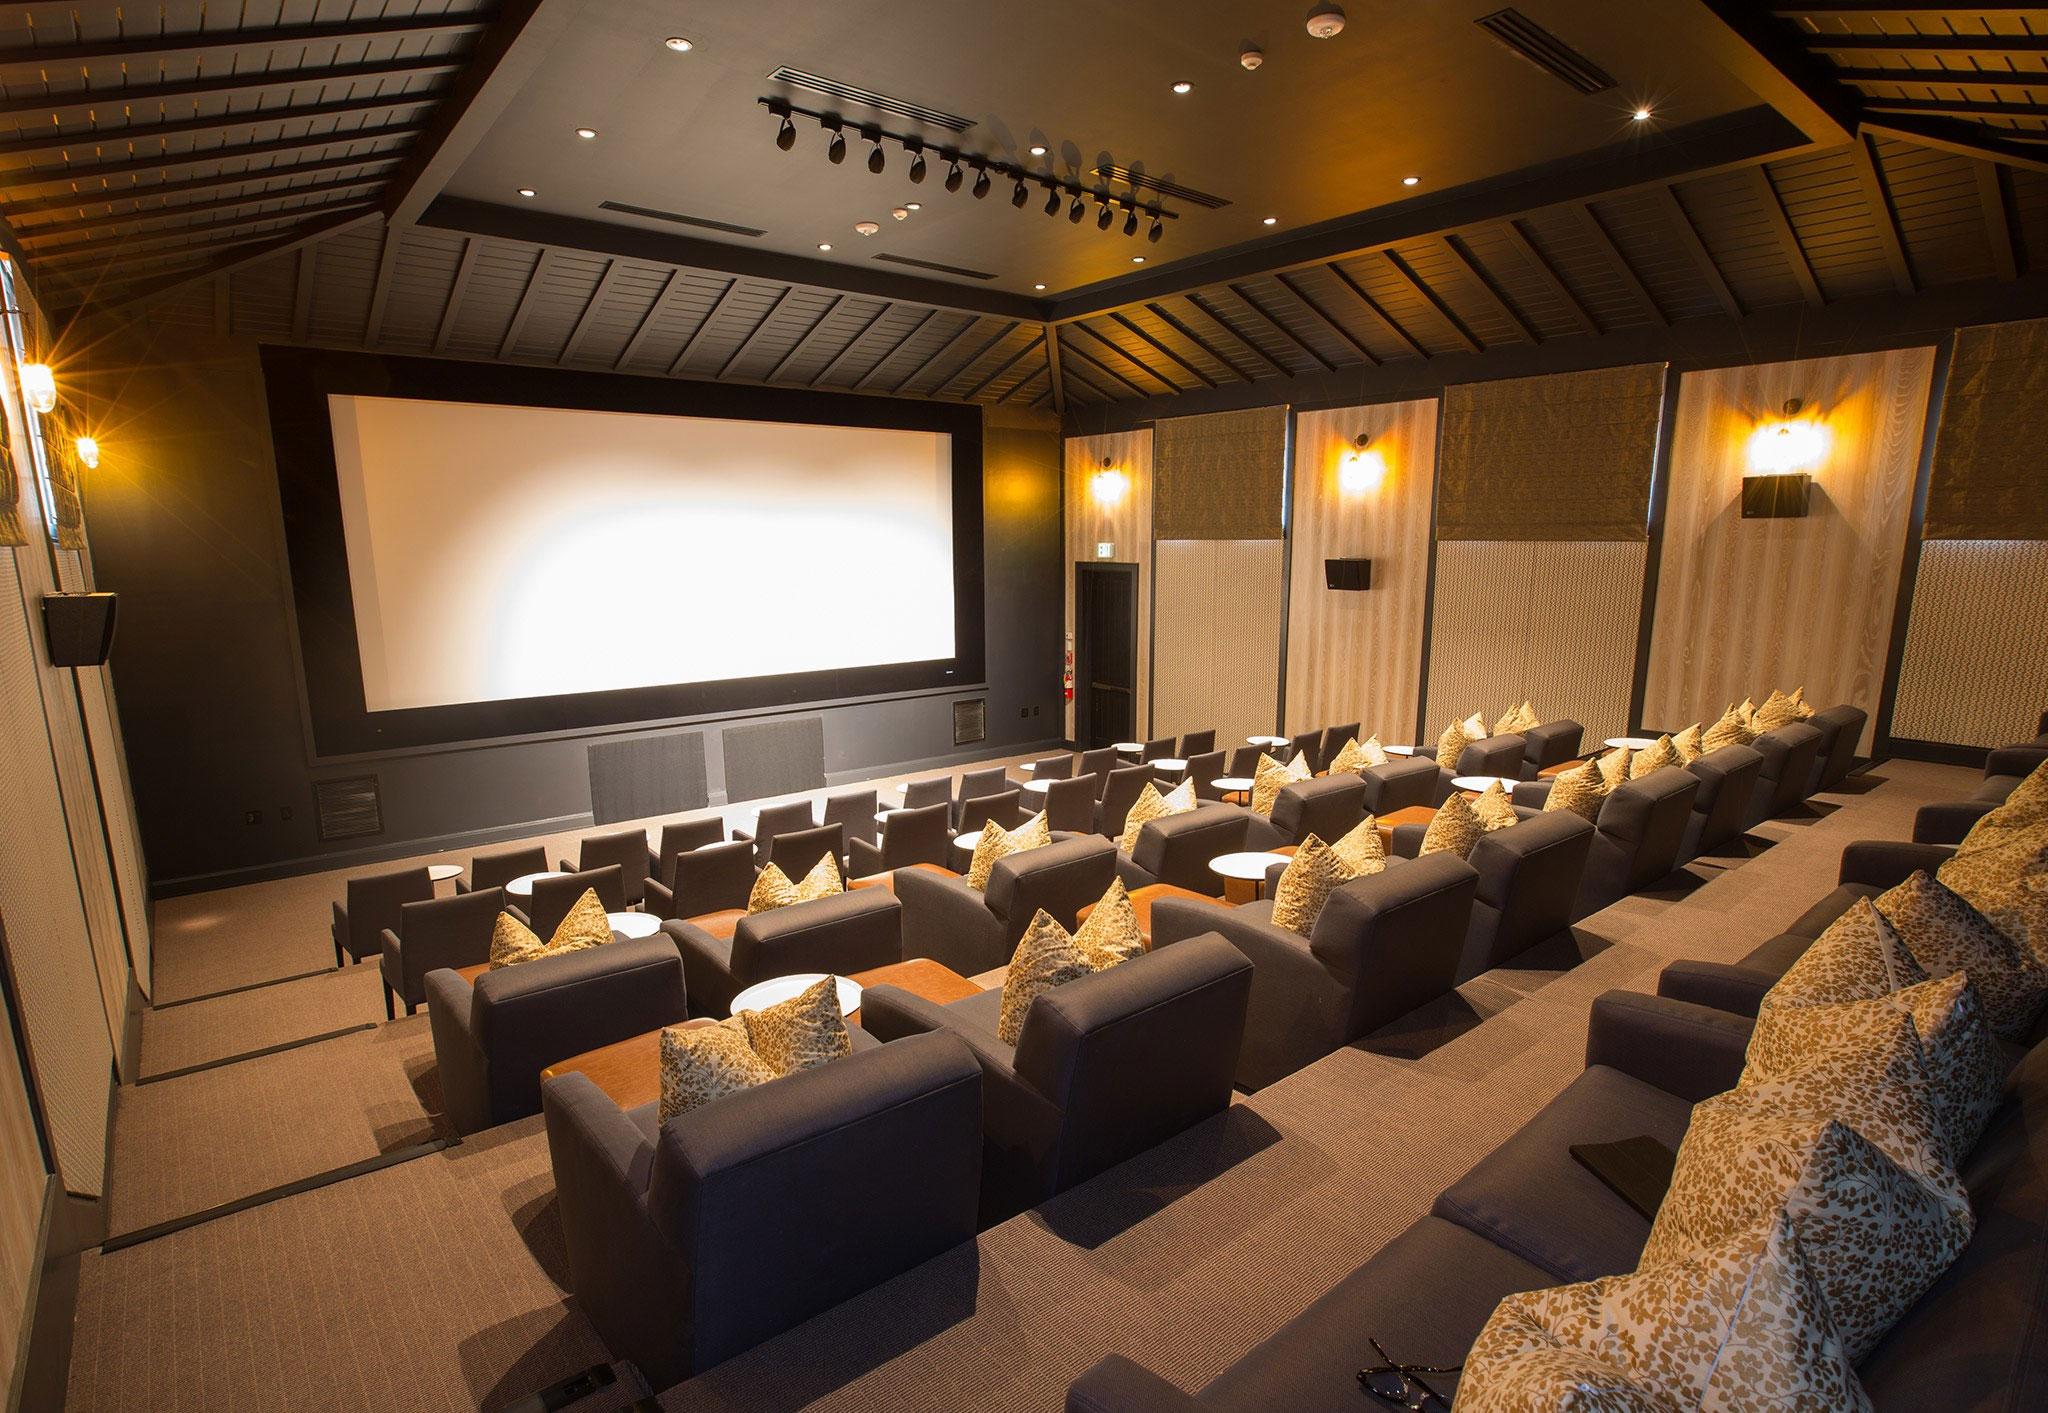 7 Private Cinemas Hidden Inside Luxury Hotels